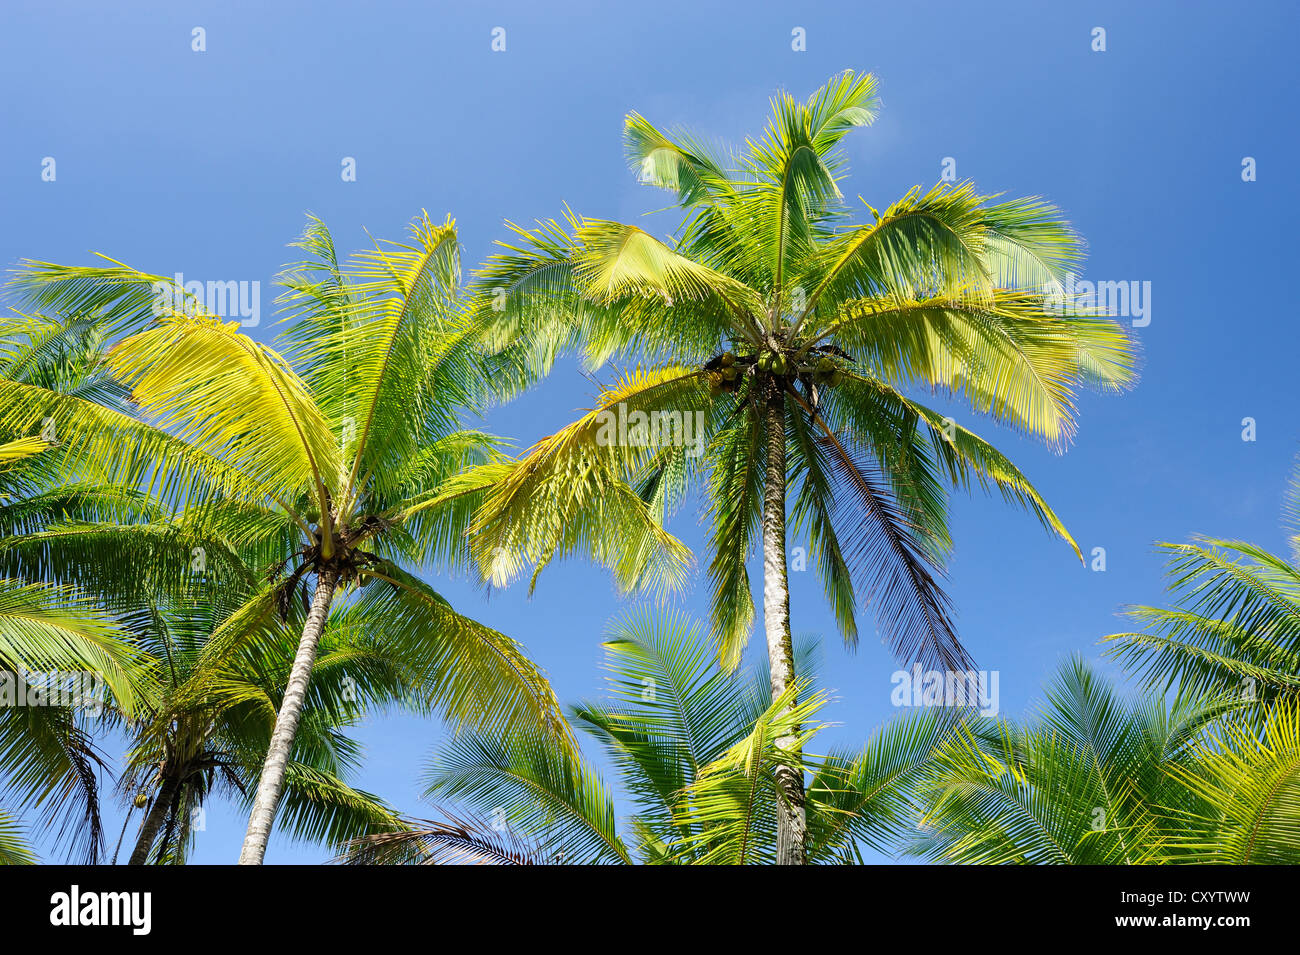 Kokospalmen (Cocos Nucifera) an die Pazifikküste, Costa Rica, Mittelamerika Stockbild